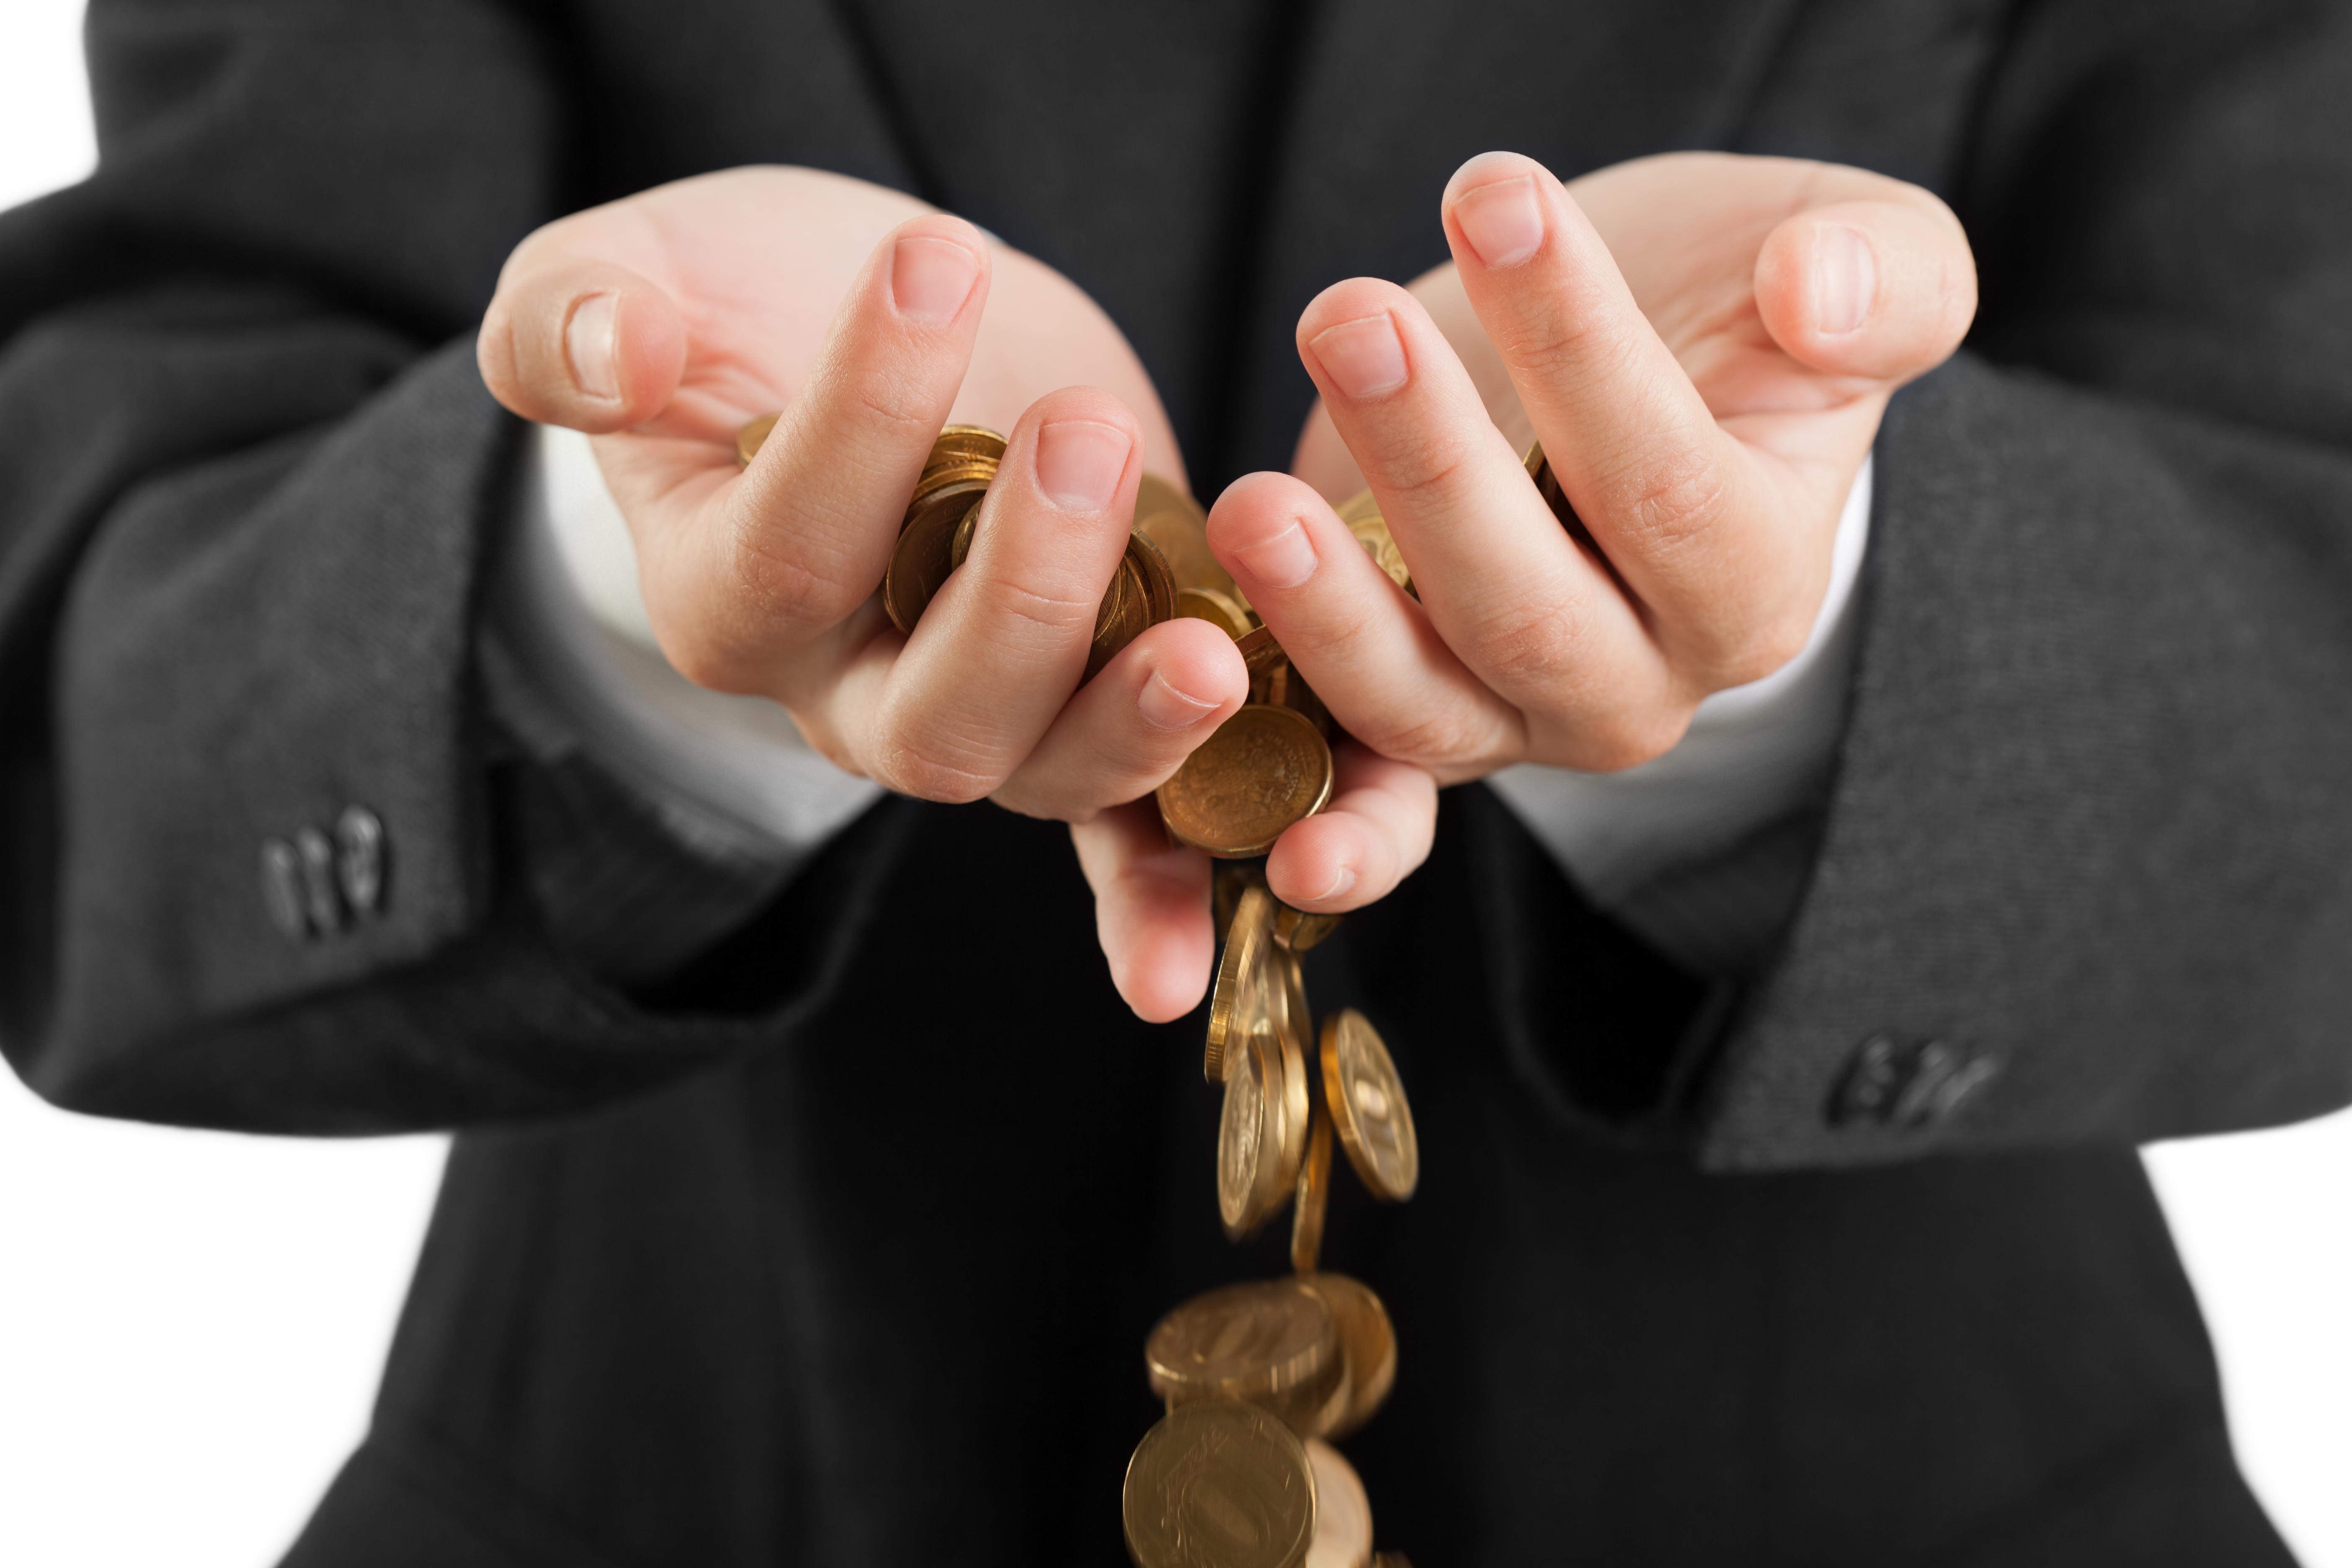 coins falling through a business man's hands